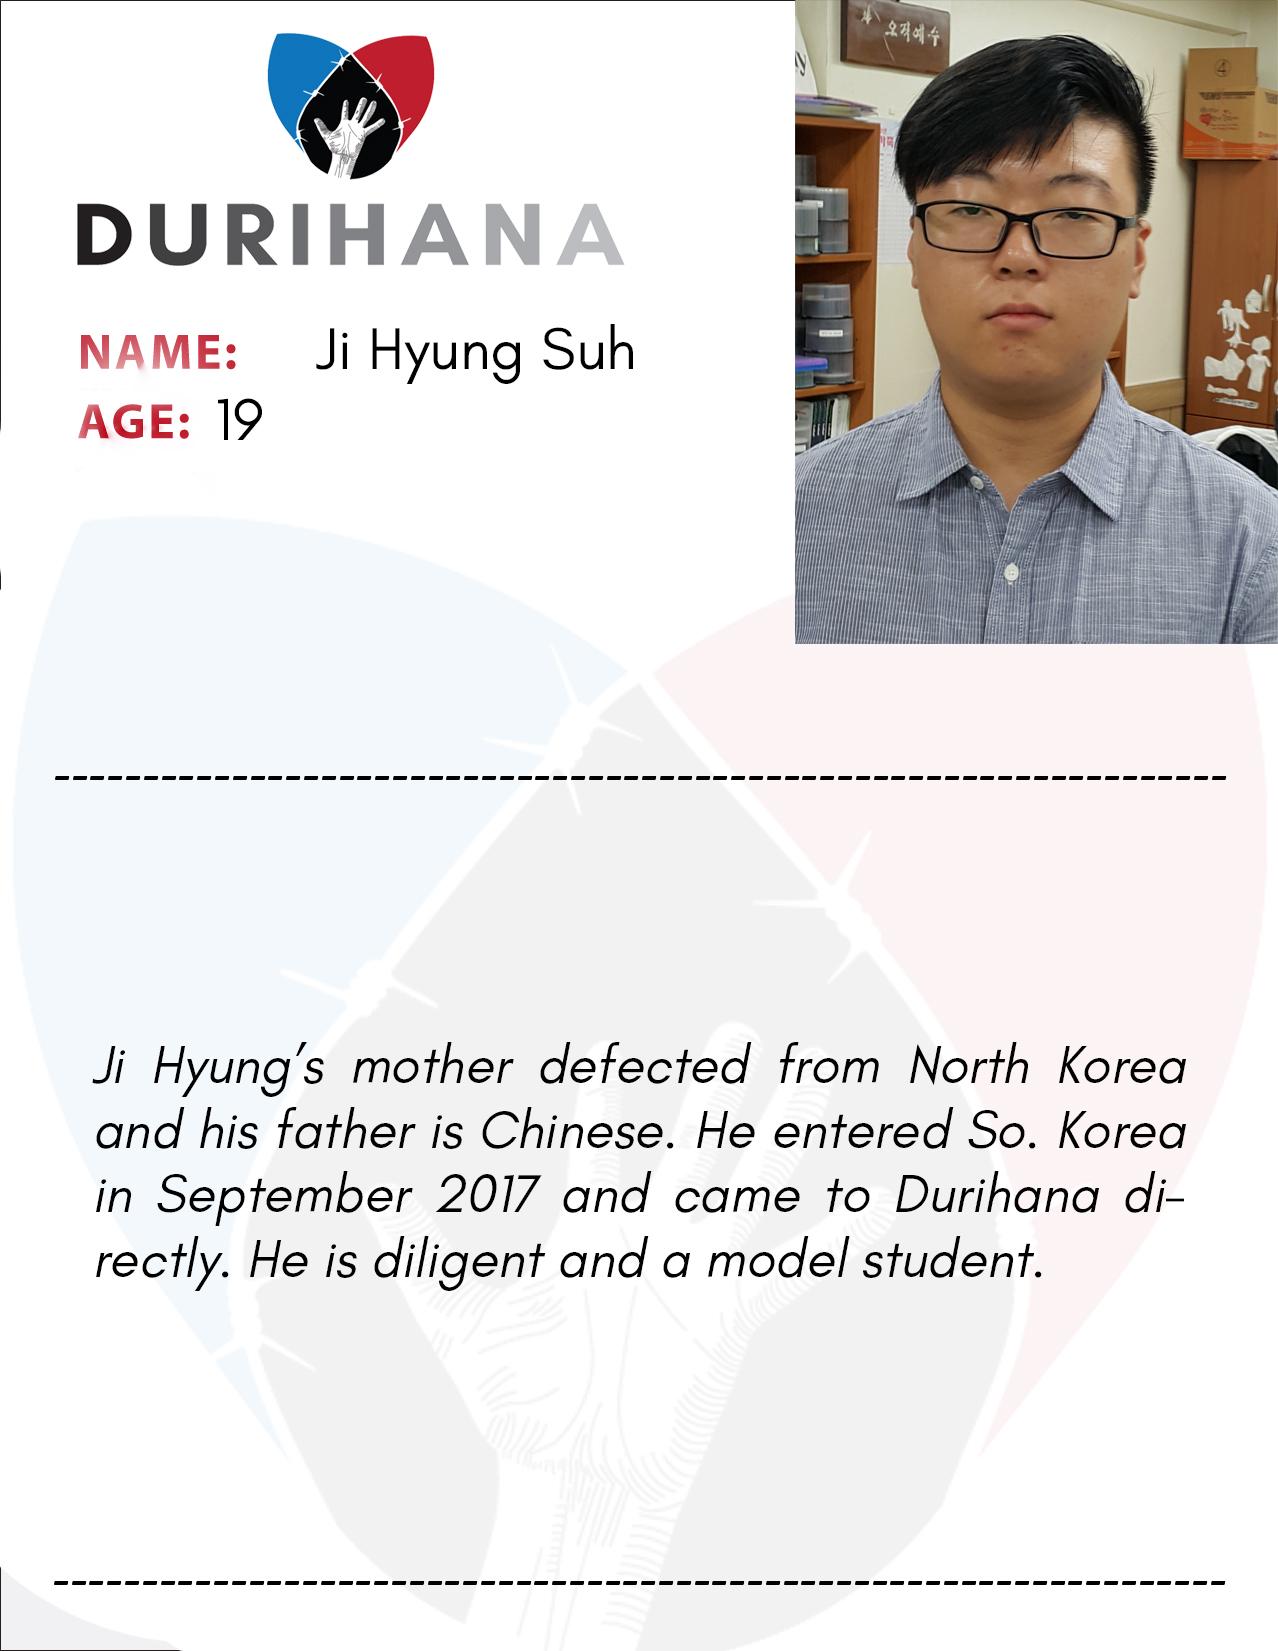 Ji Hyung Suh